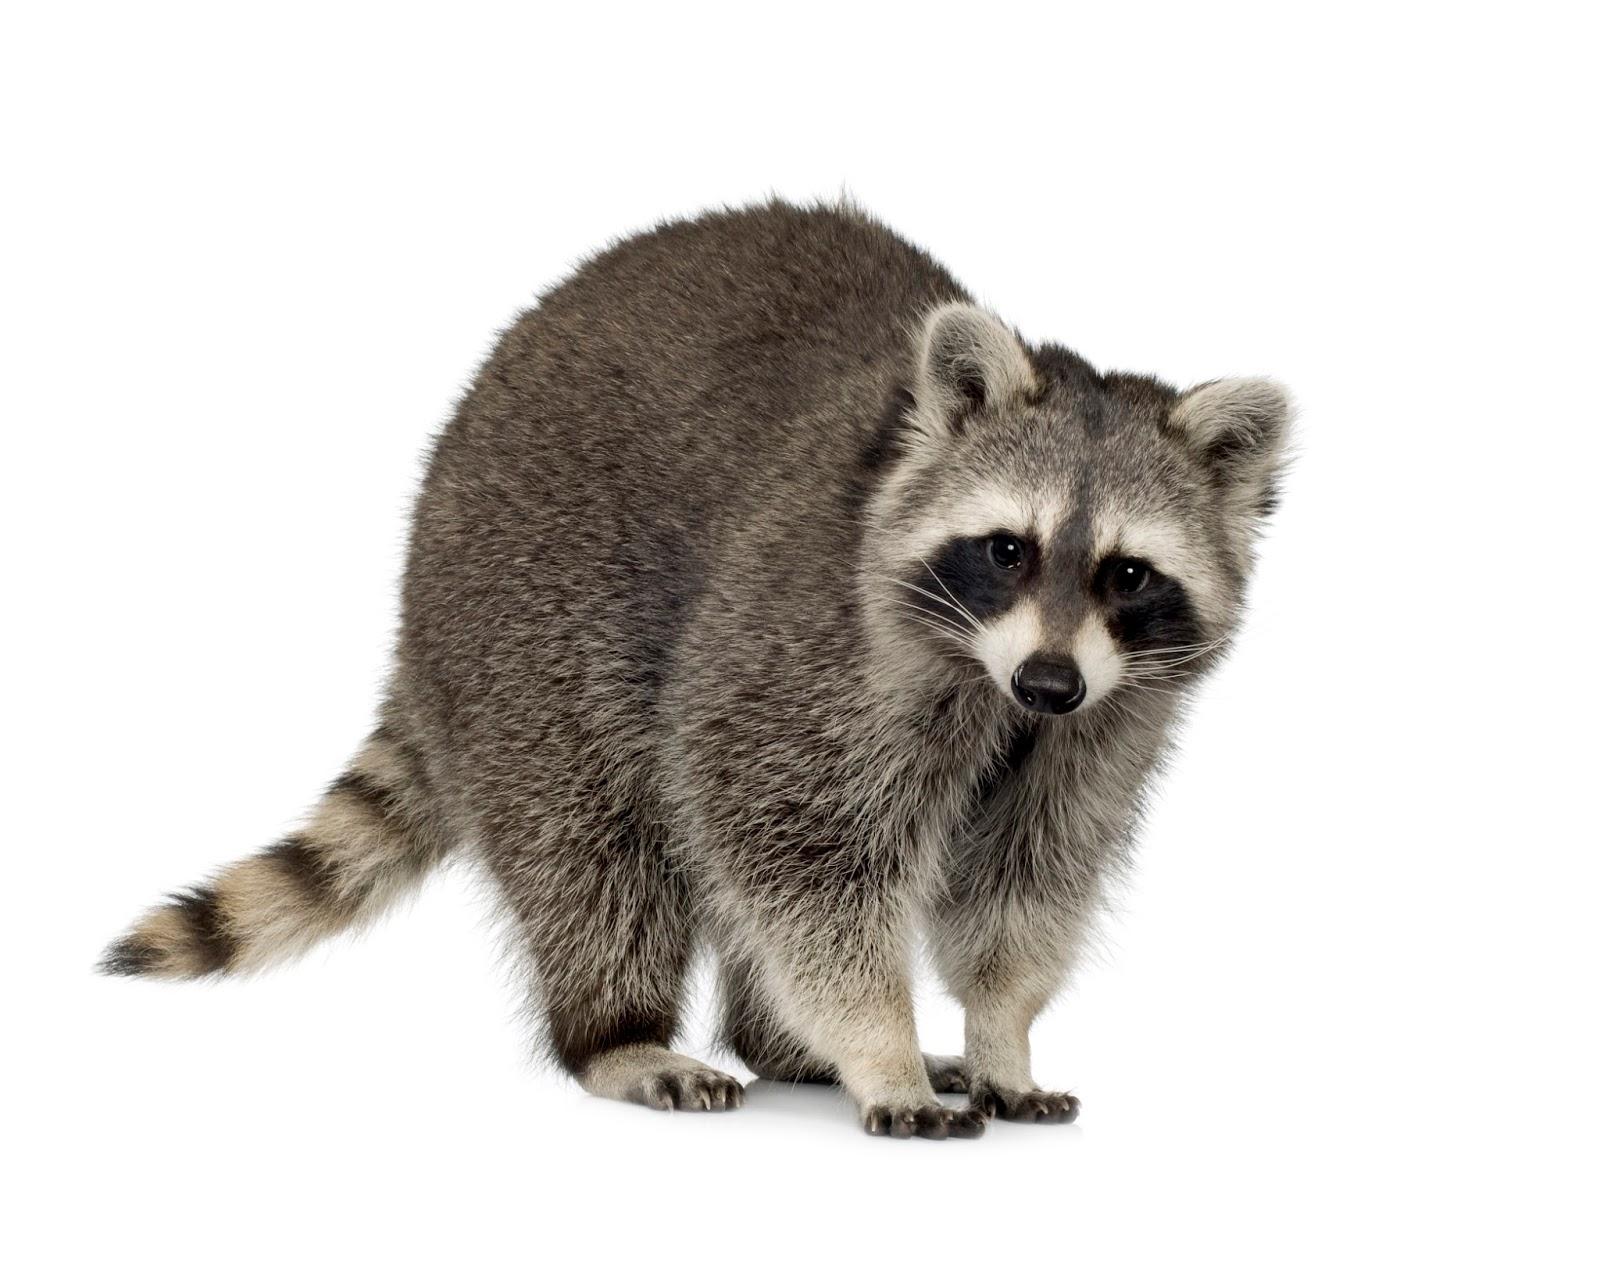 Drawn raccoon realistic July 2015 Tuesday July 166: